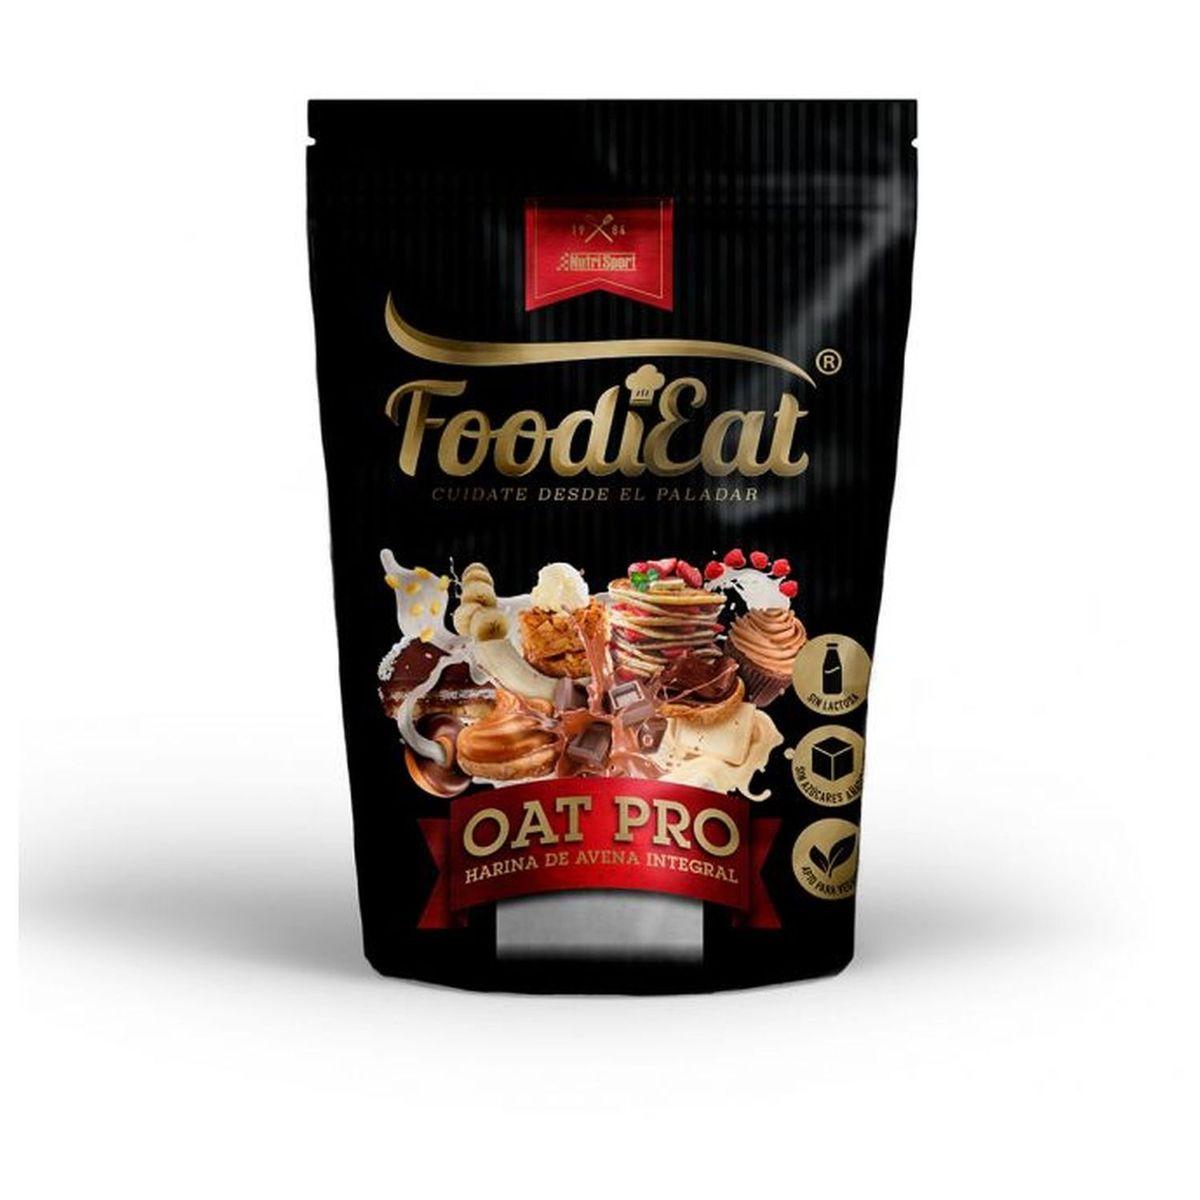 FoodiEat - OATPRO Harina de Avena Integral -  Vainilla Cookies - 1,5kg